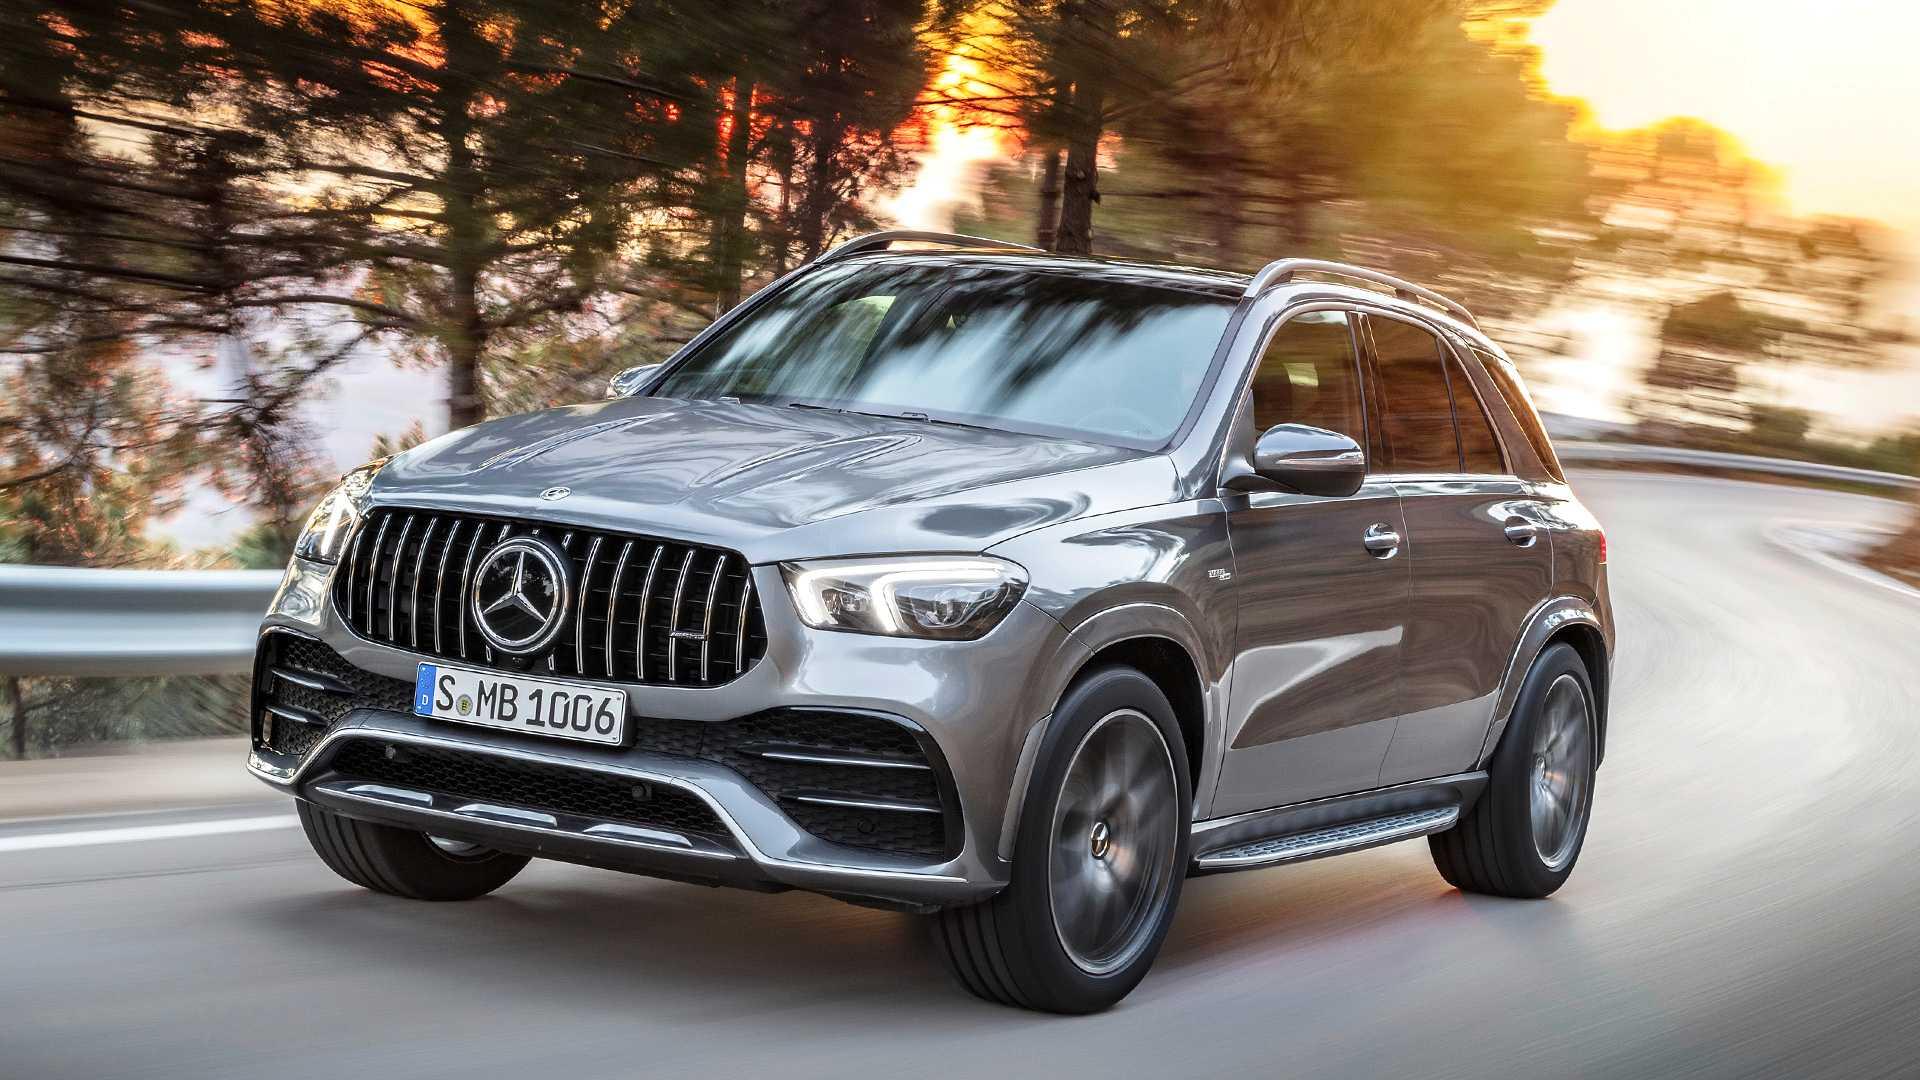 Mercedes-AMG GLE 53 4MATIC : 435 CV, etiqueta ECO... a partir de 94.100 euros